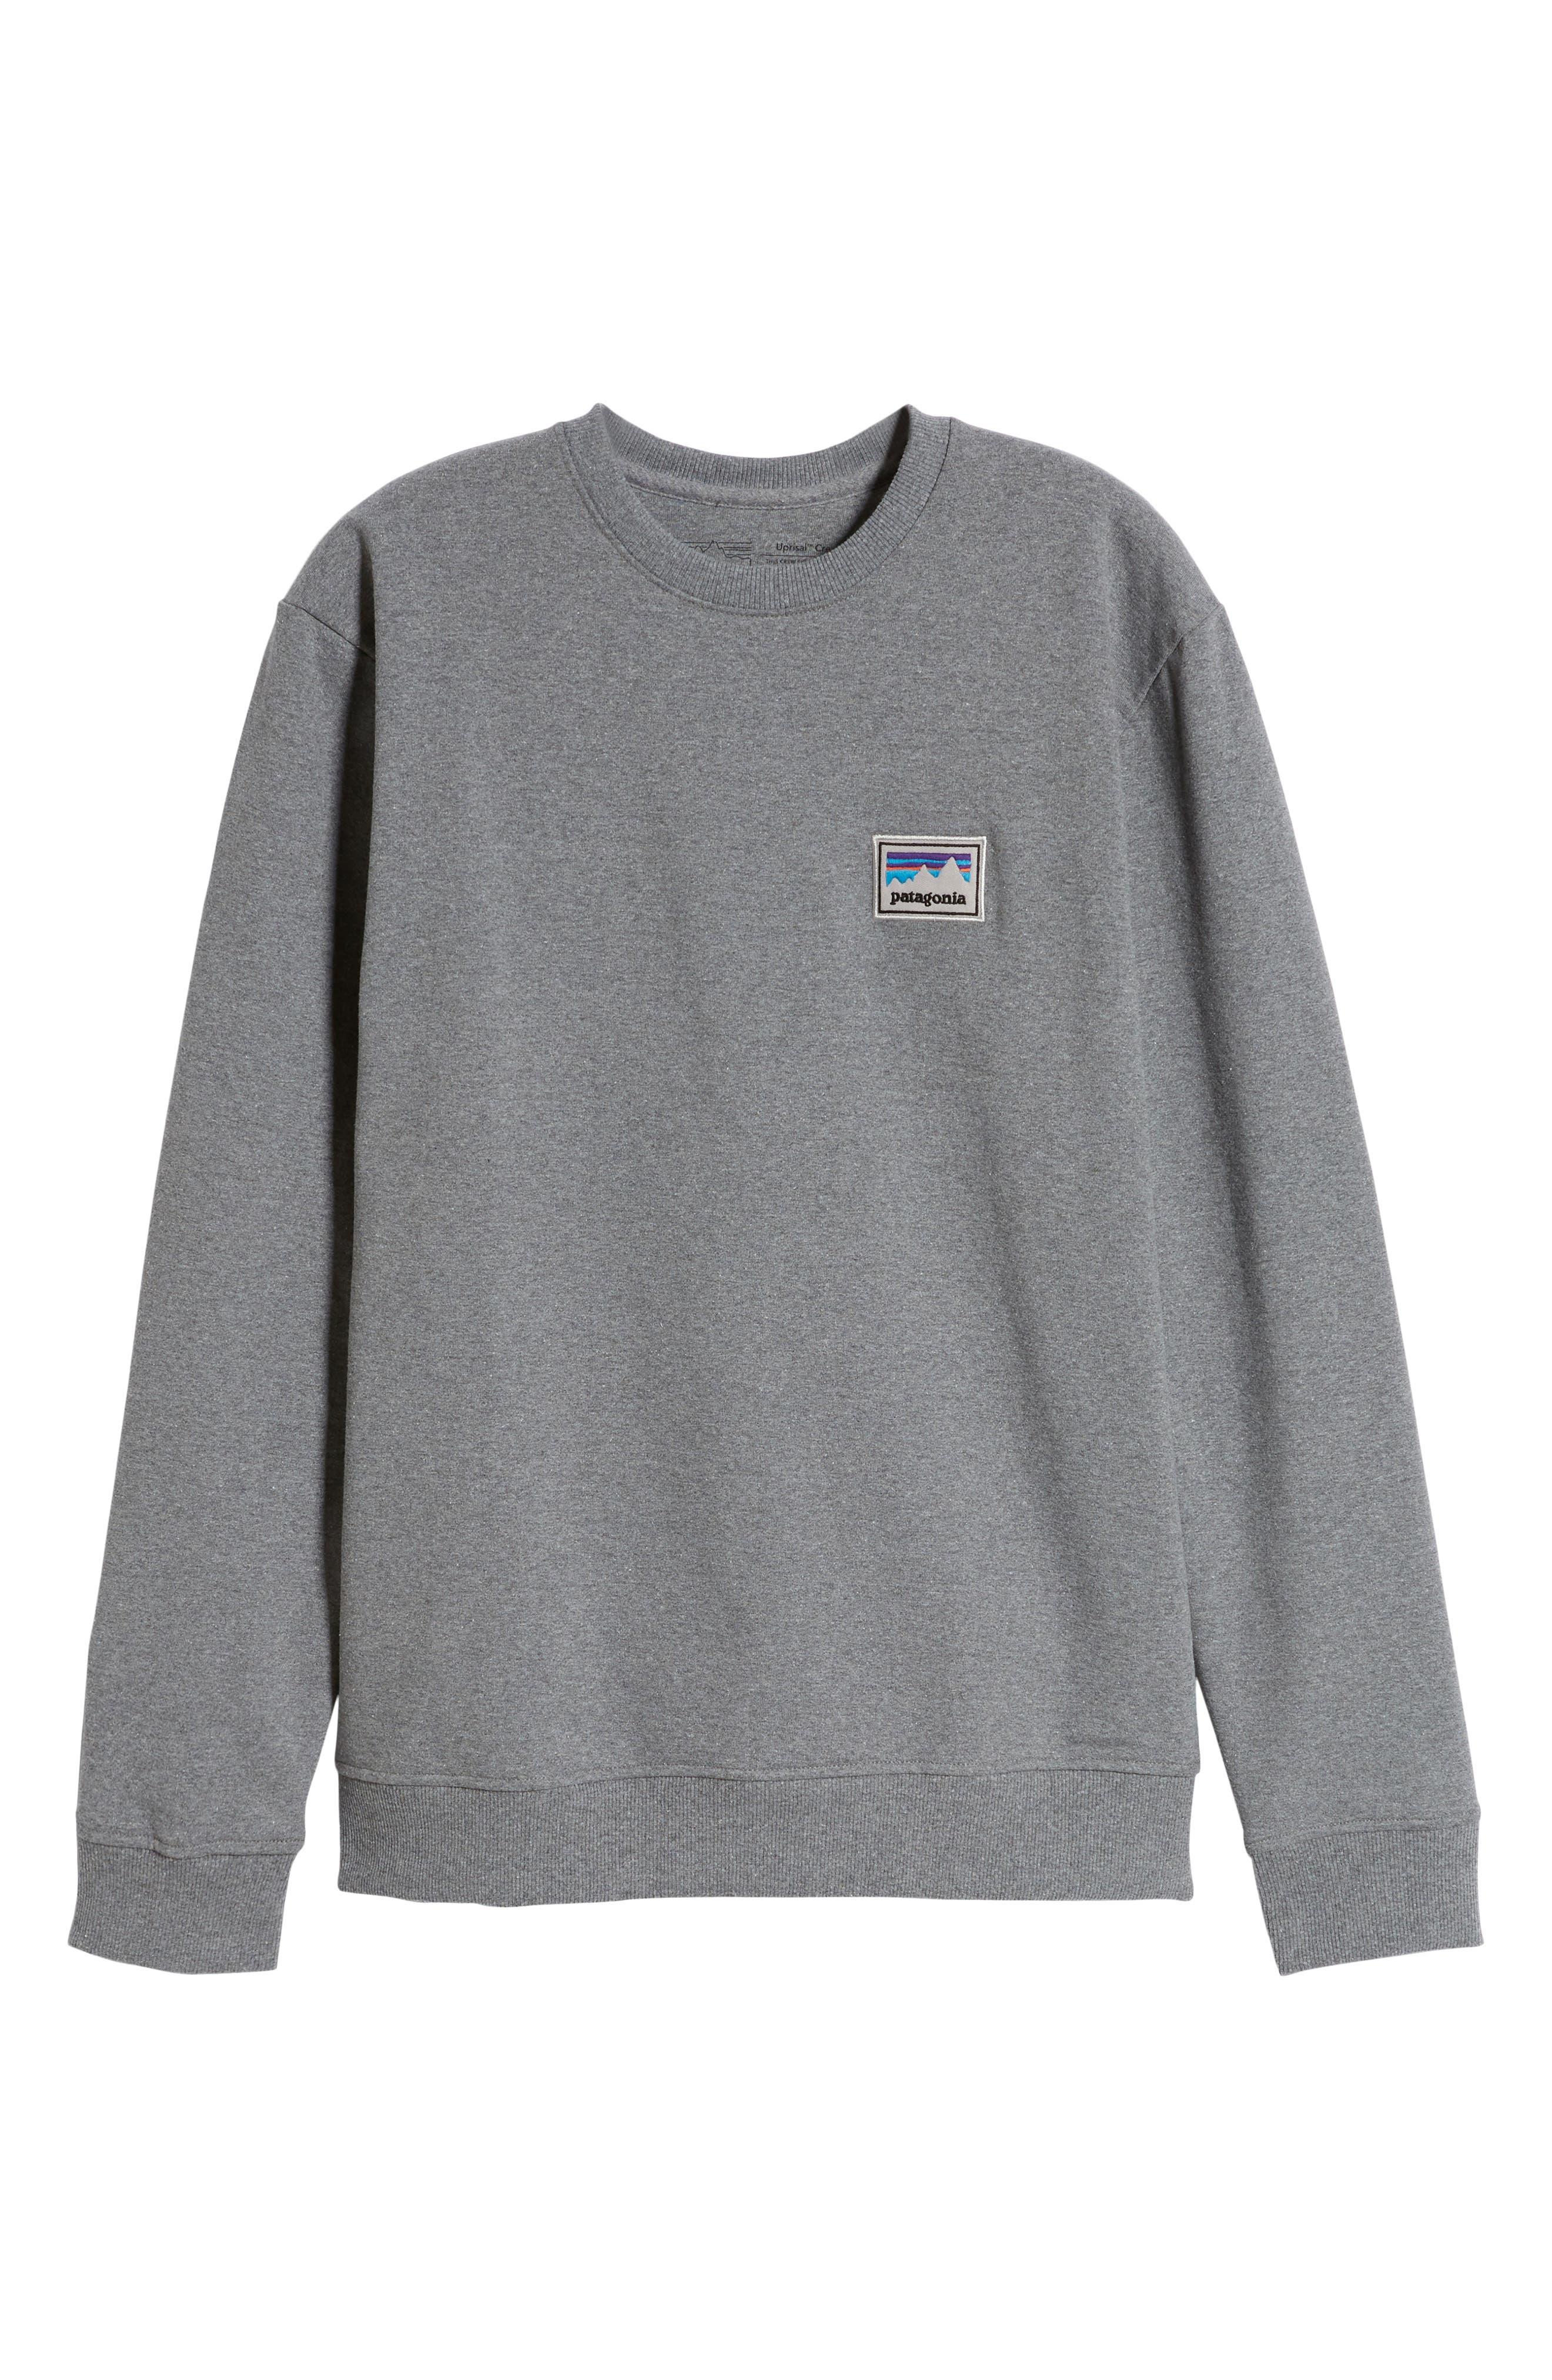 PATAGONIA,                             Shop Sticker Patch Uprisal Crew Sweatshirt,                             Alternate thumbnail 6, color,                             GRAVEL HEATHER